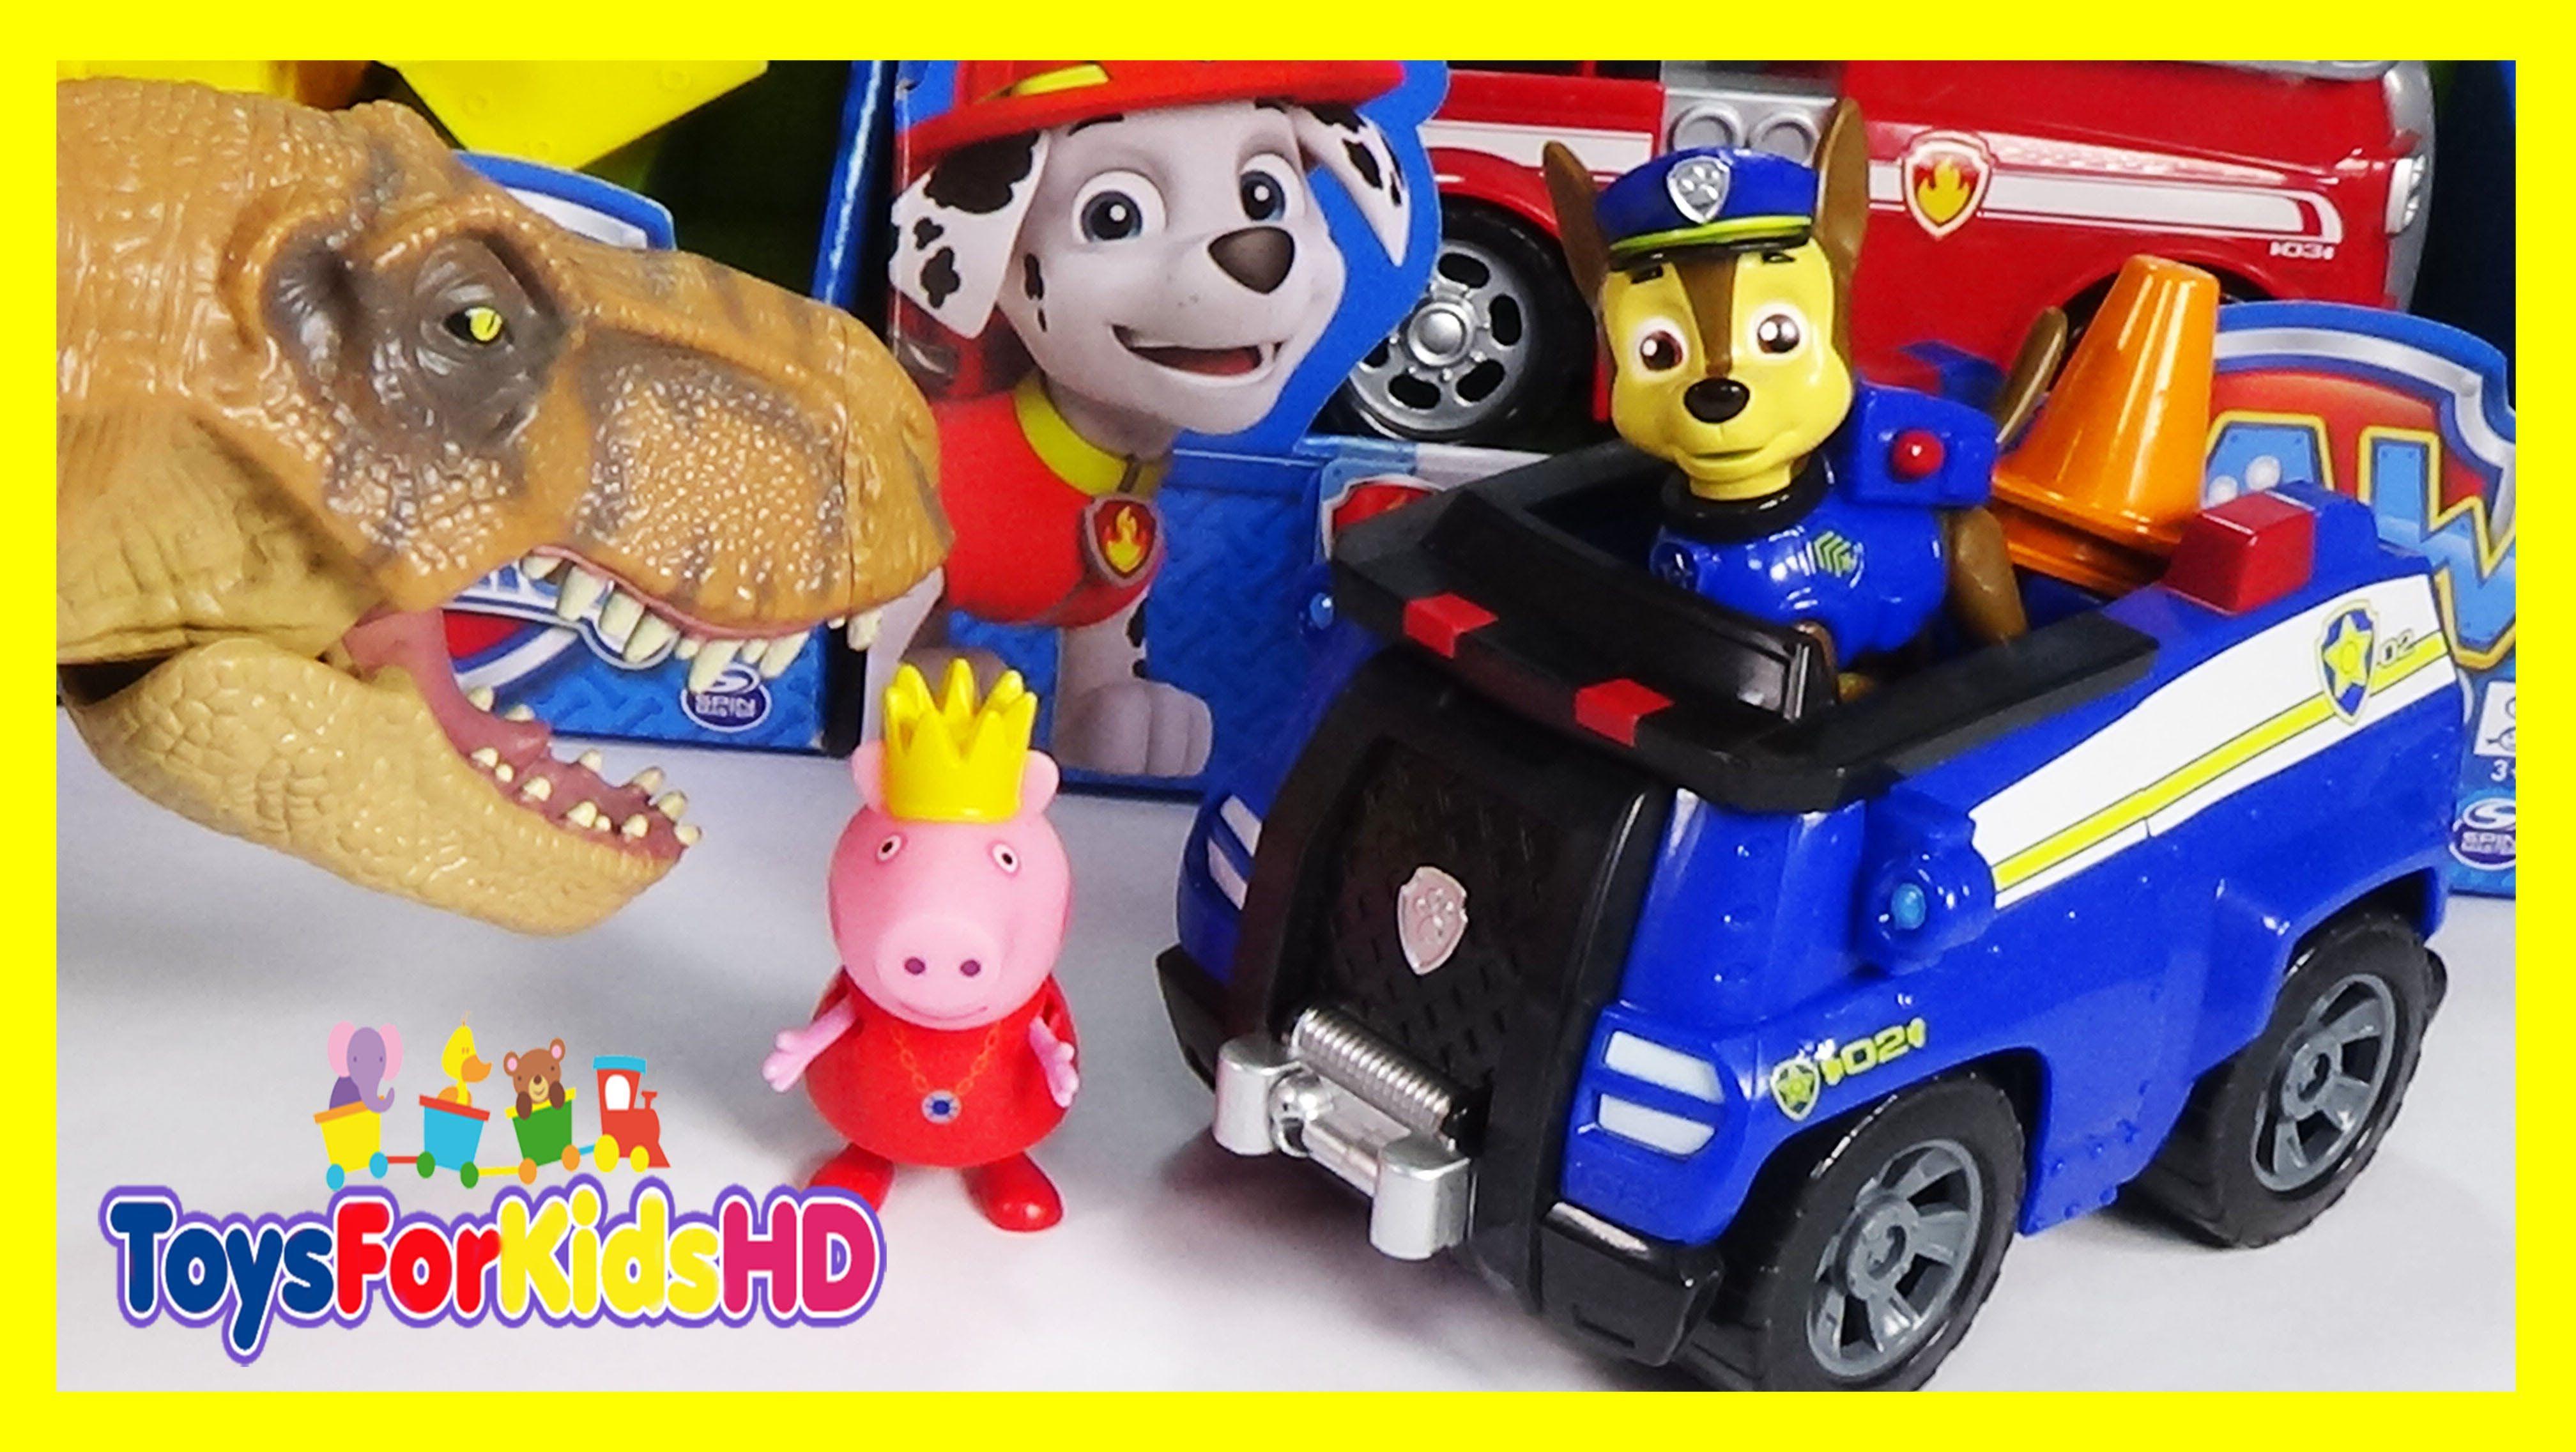 La Patrulla Canina - Juguetes Paw Patrol en español Chase's Patrulla de  Cachorros ToysForKidsHD